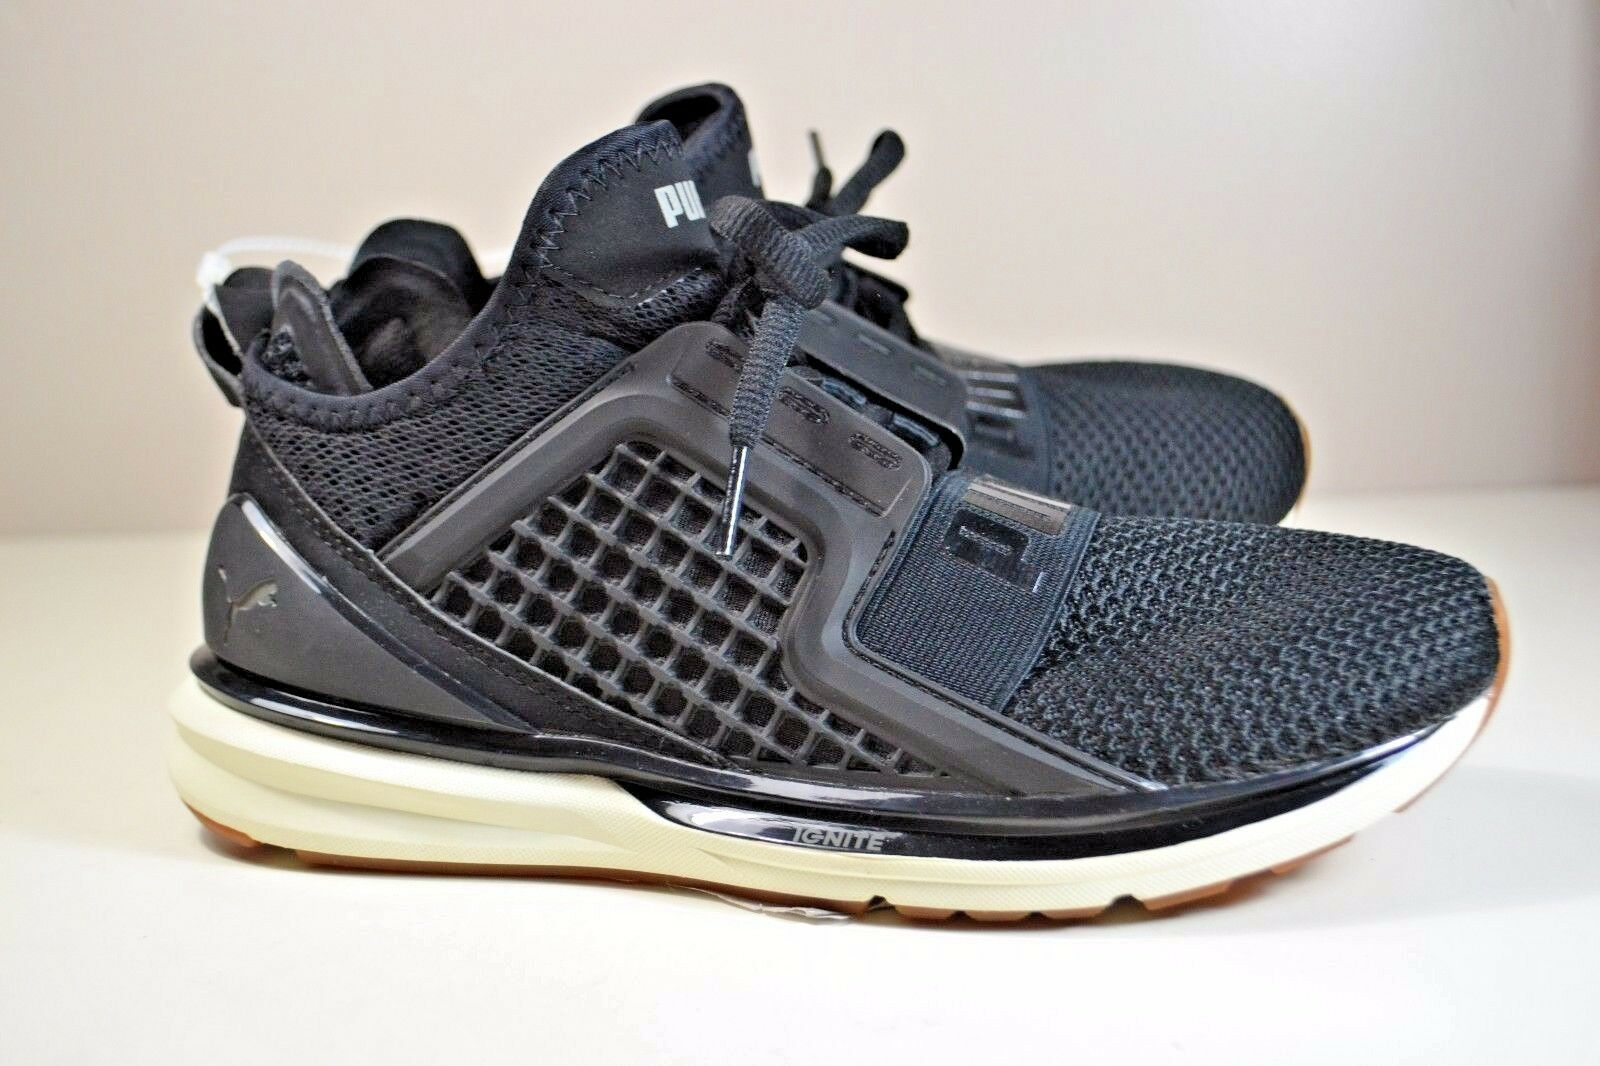 NWT WOMEN'S PUMA BLACK IGNITE ATHLETIC SNEAKERS Schuhe SZ 7